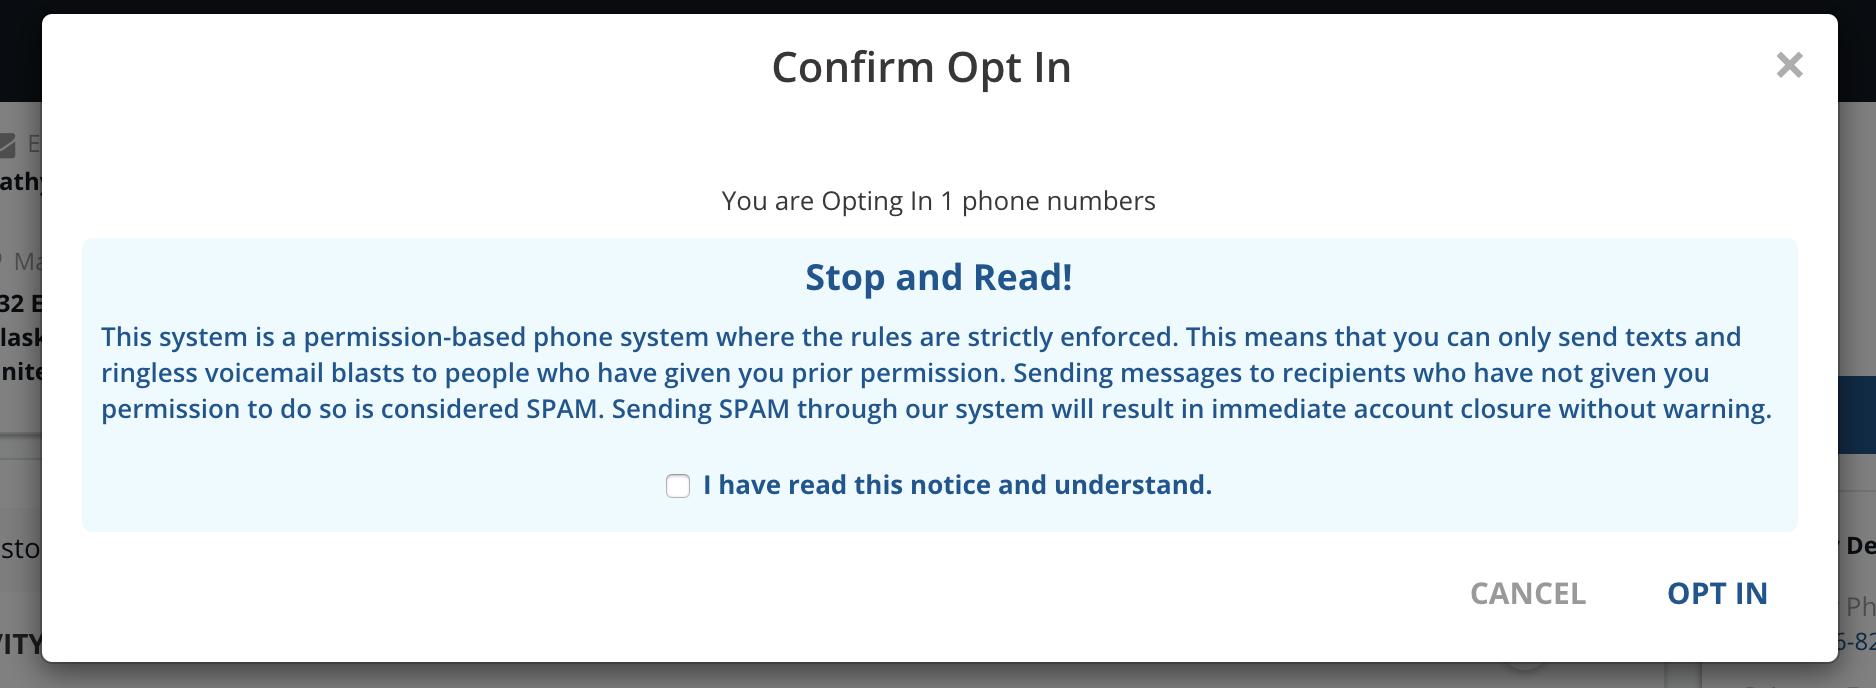 Confirm Optin